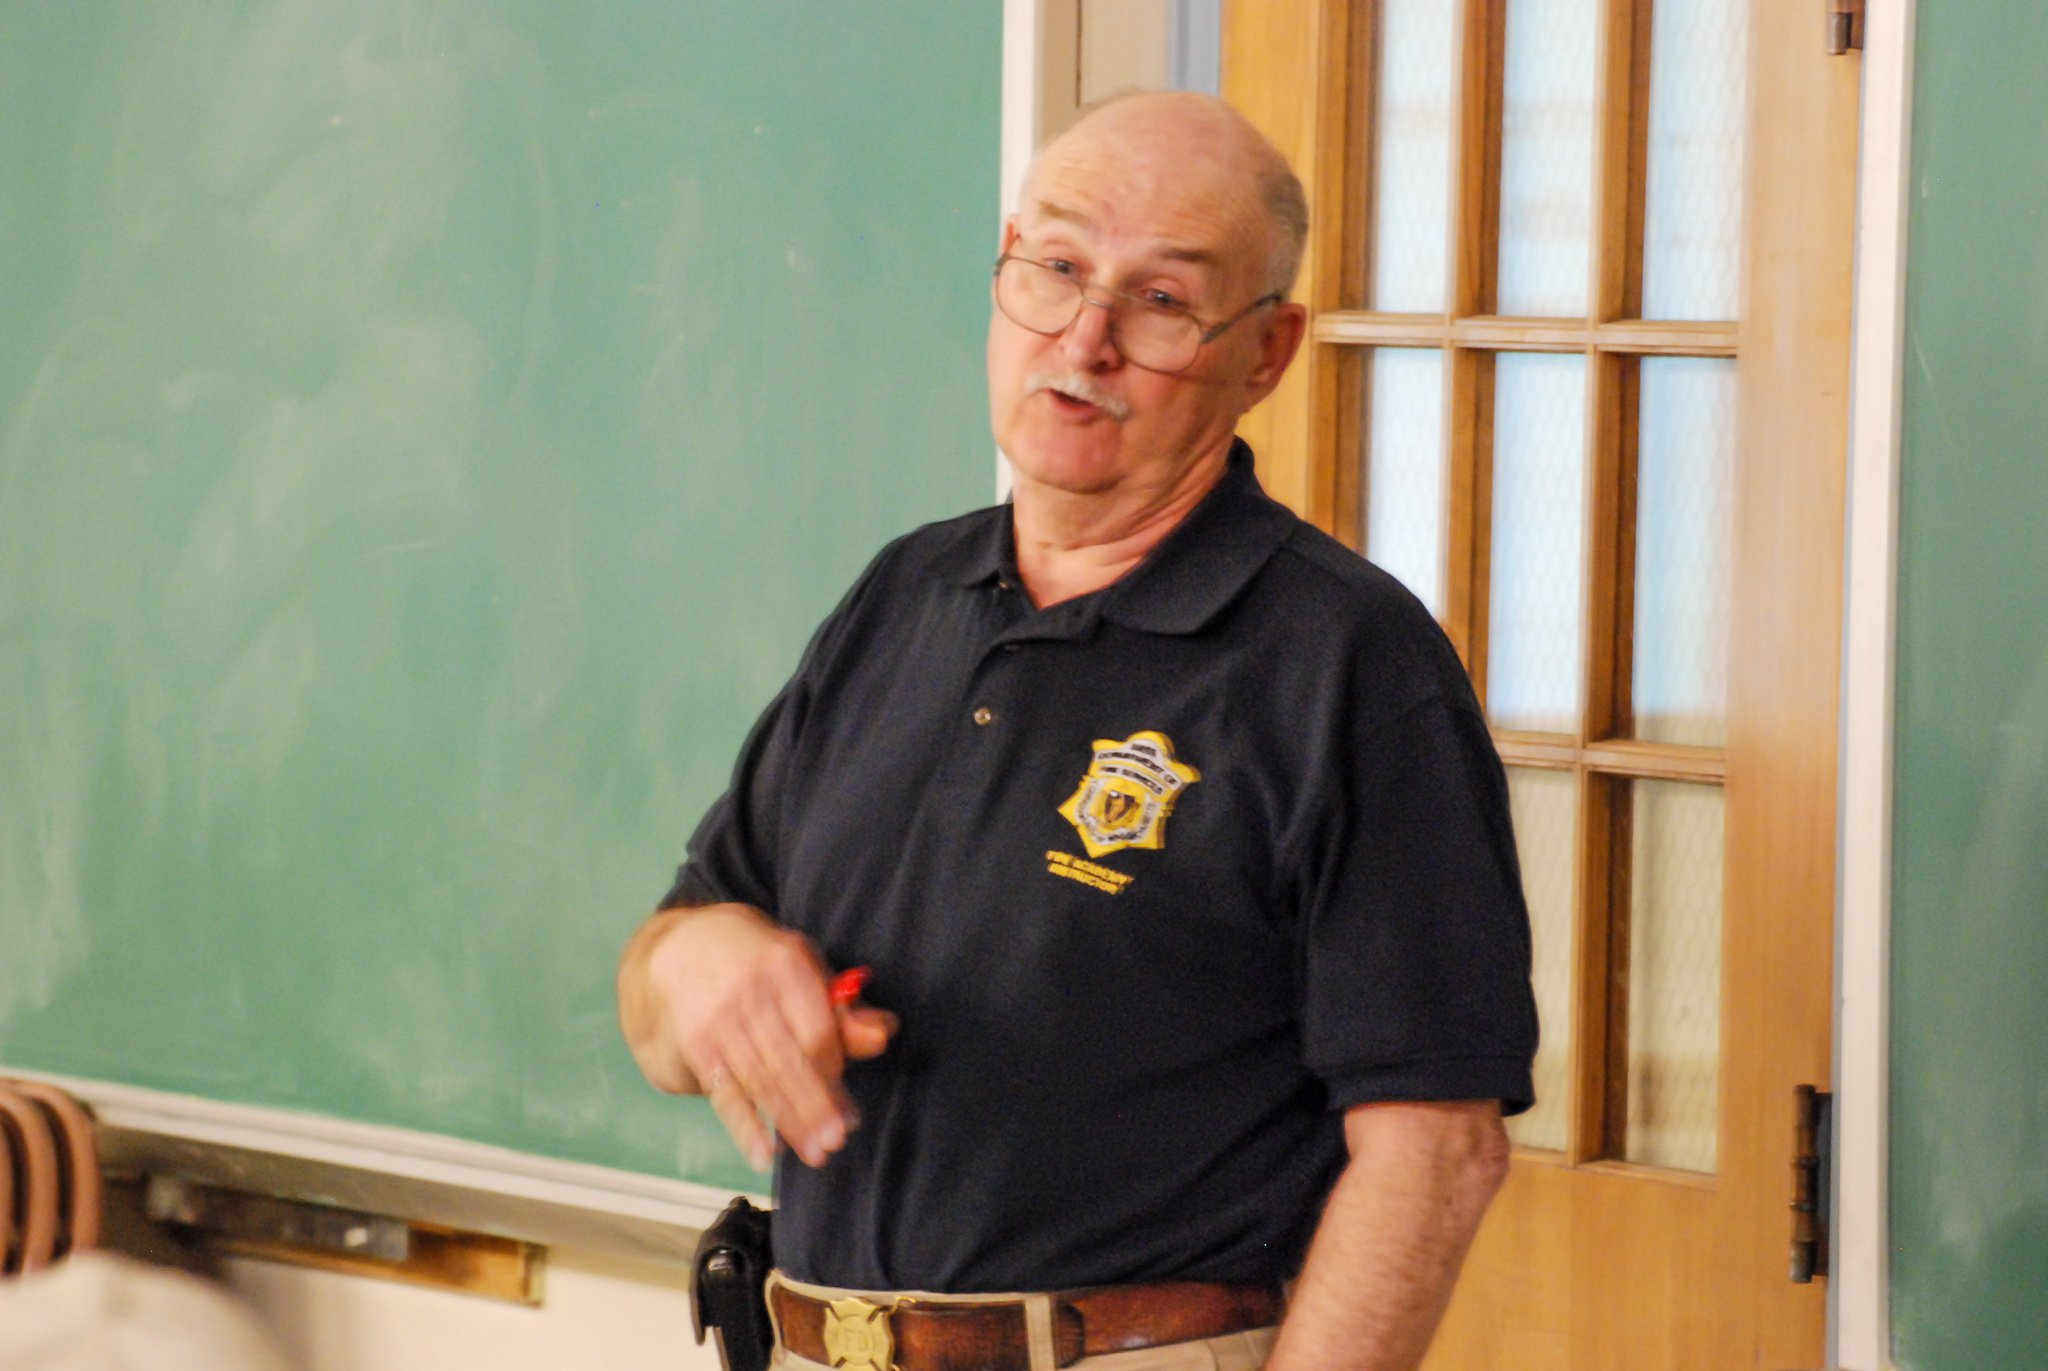 MA Fire Academy Impact Drills